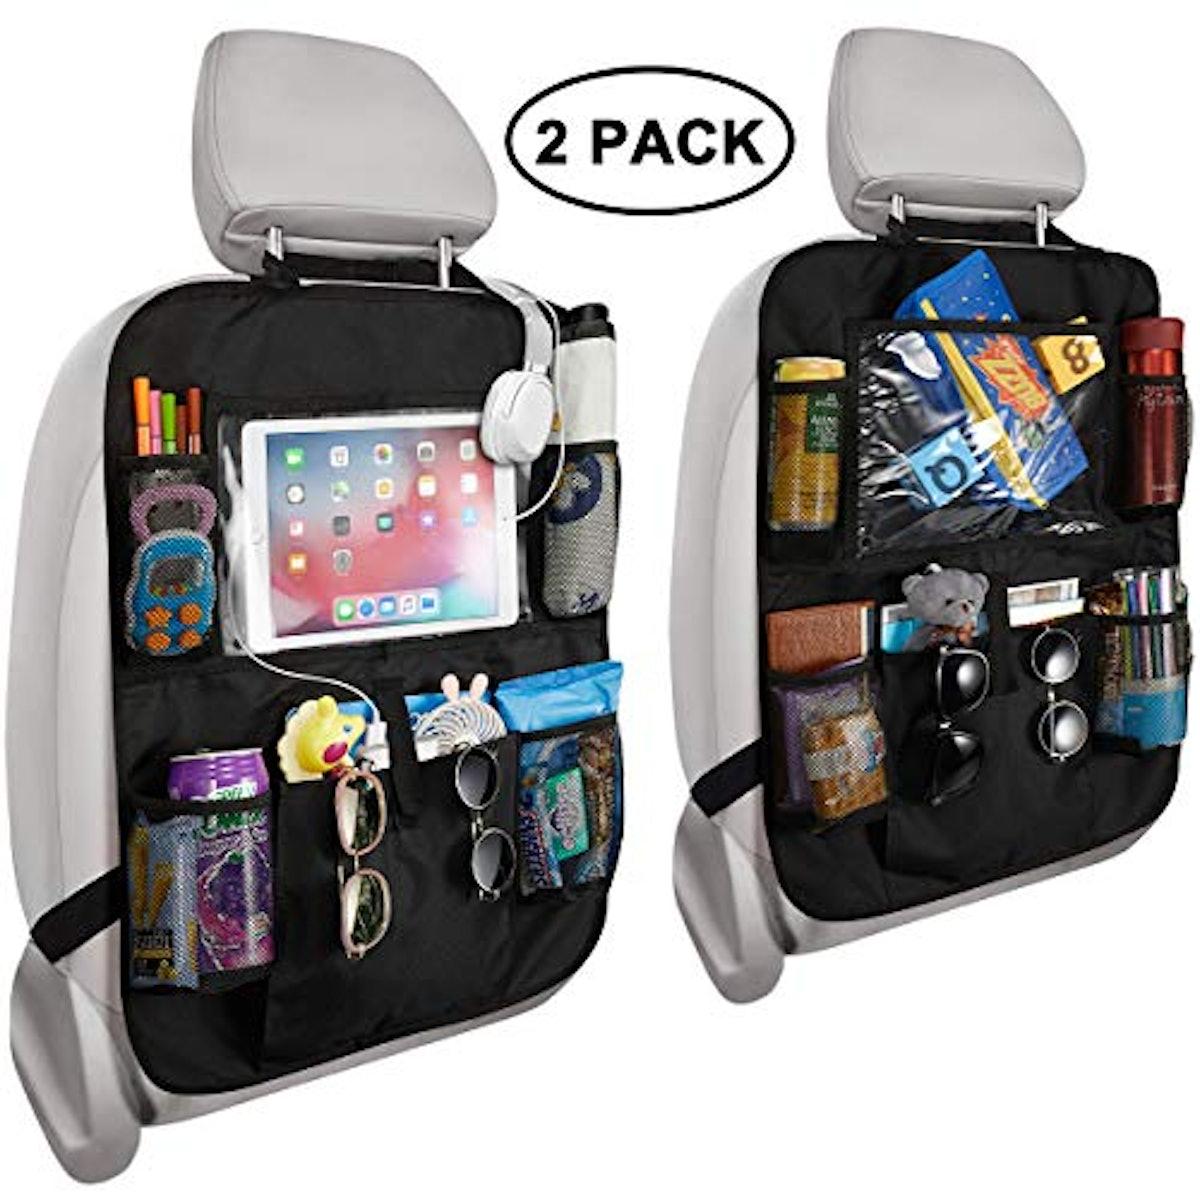 Reserwa Car Backseat Organizer 2 Pack Waterproof and Durable